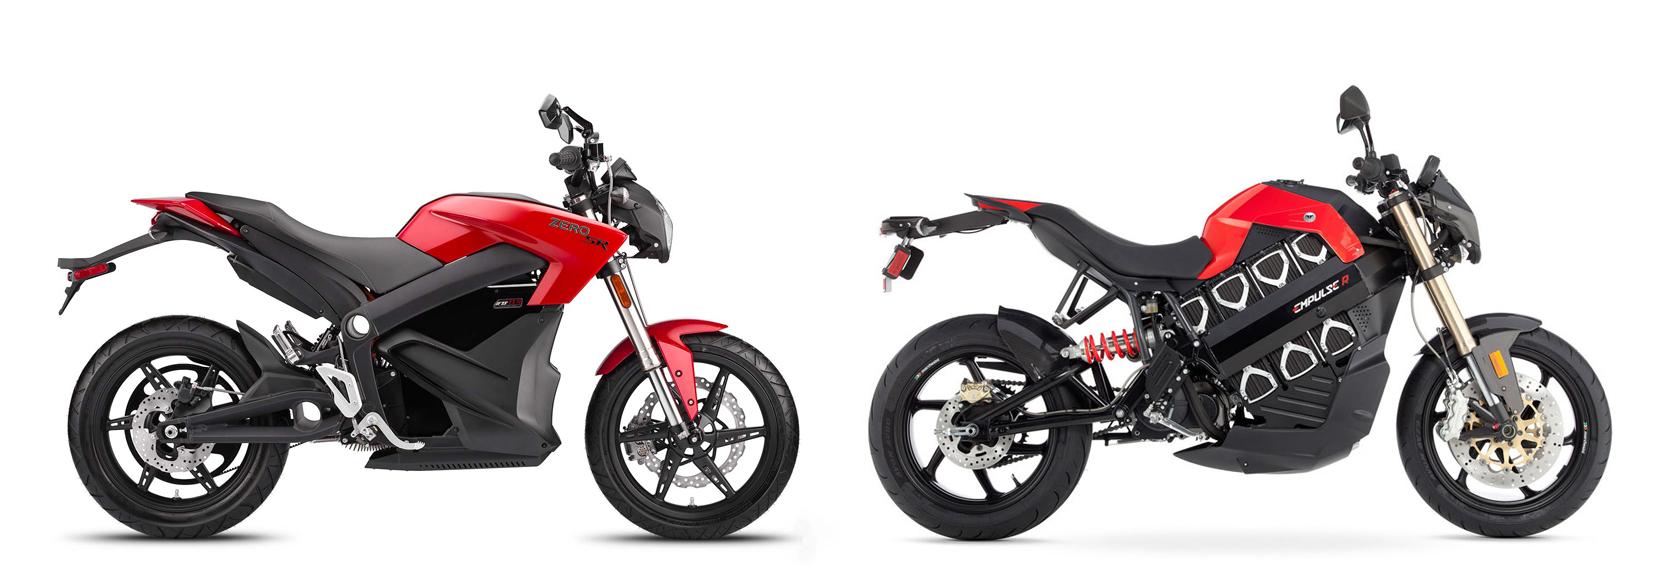 Zero Motorcycles 2014 Zero sr 2014 Zero sr / 2013 Brammo